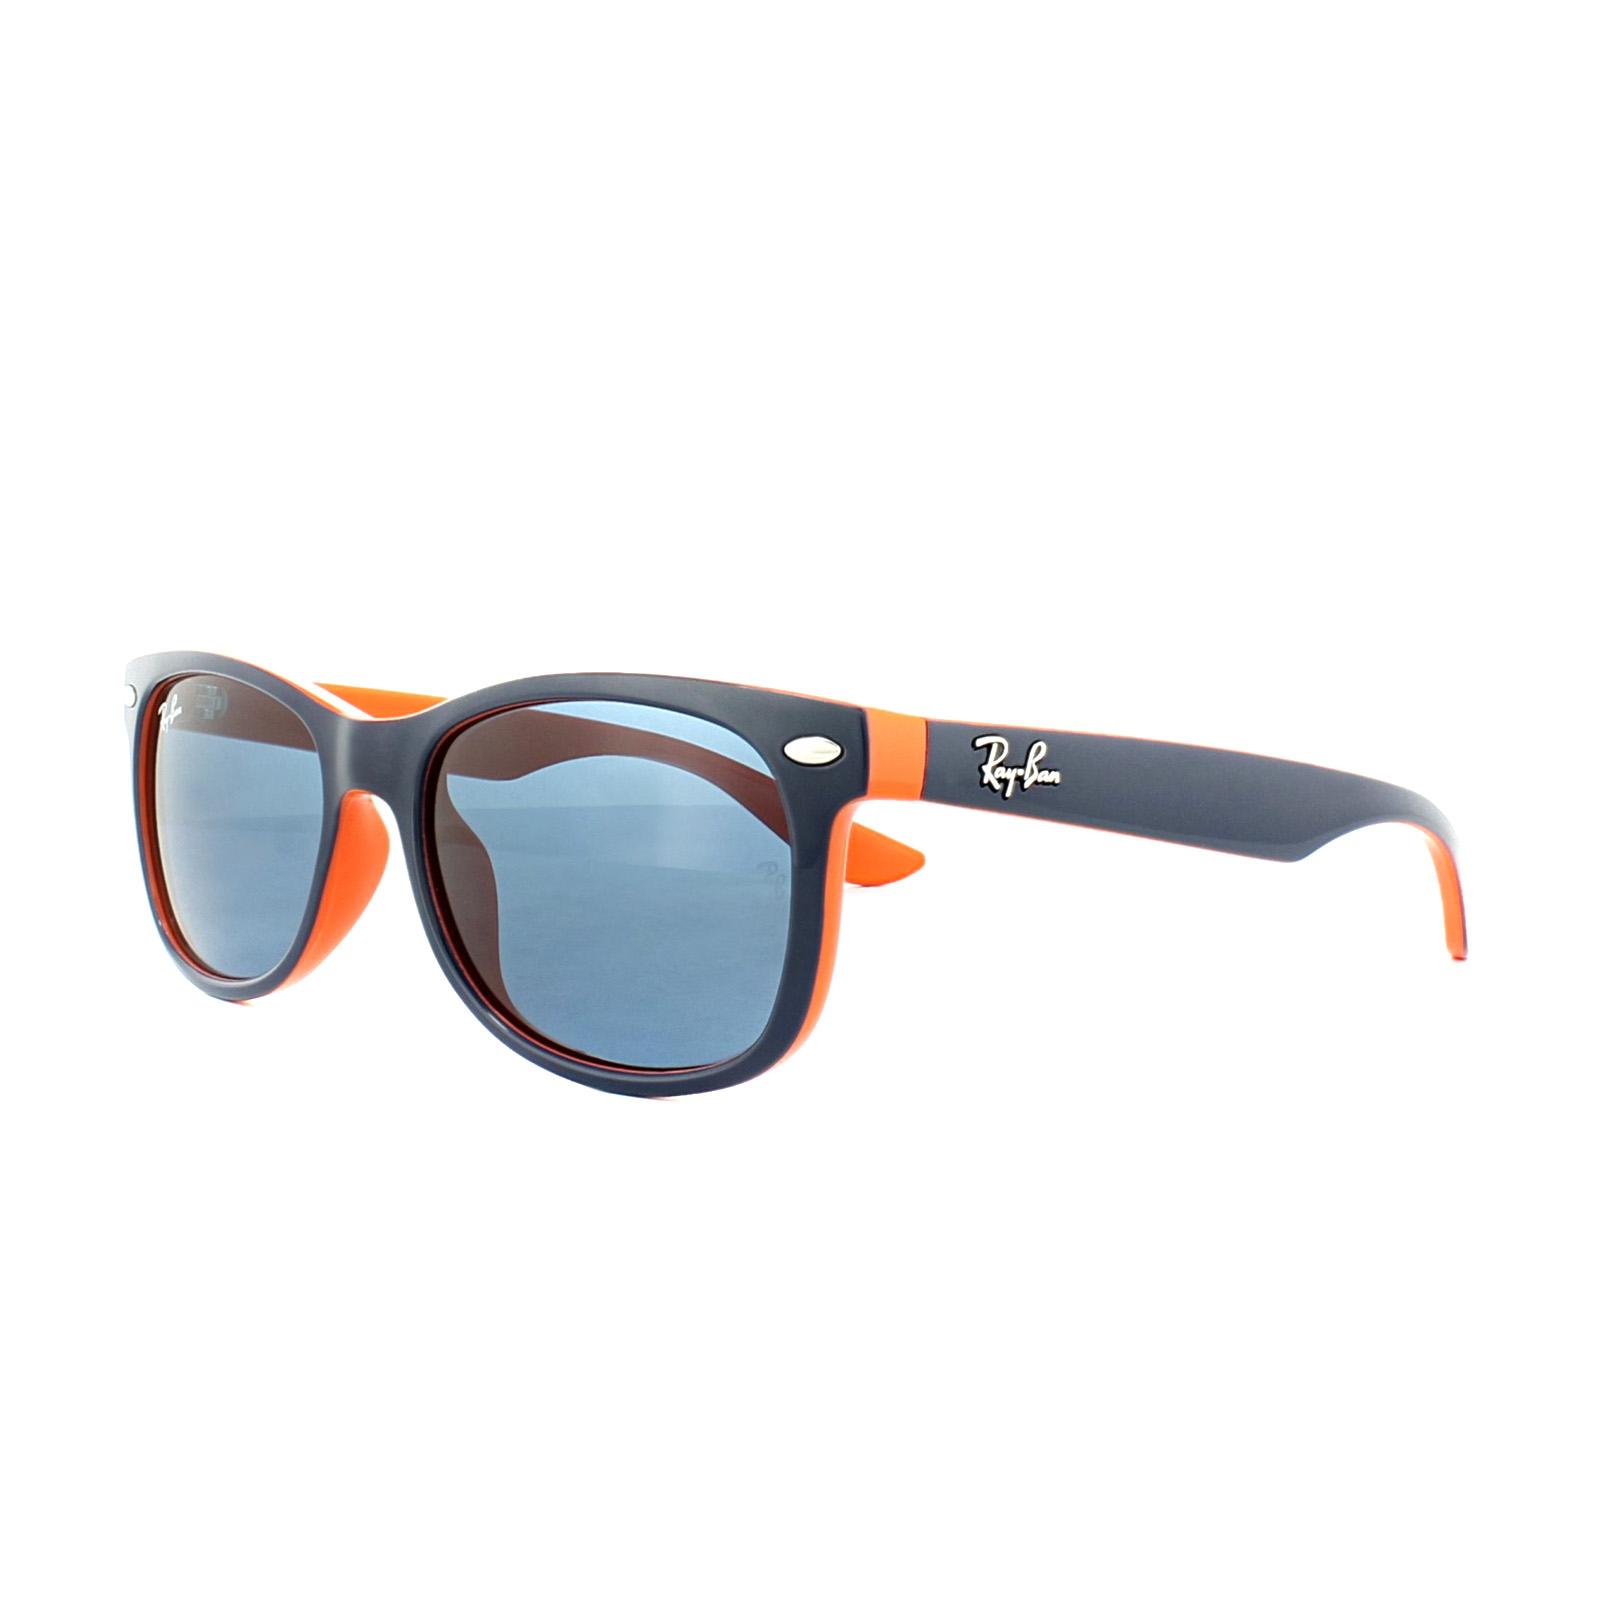 daa0a169c57d5 Sentinel Ray-Ban Junior Sunglasses 9052 178 80 Dark Blue   Orange Blue